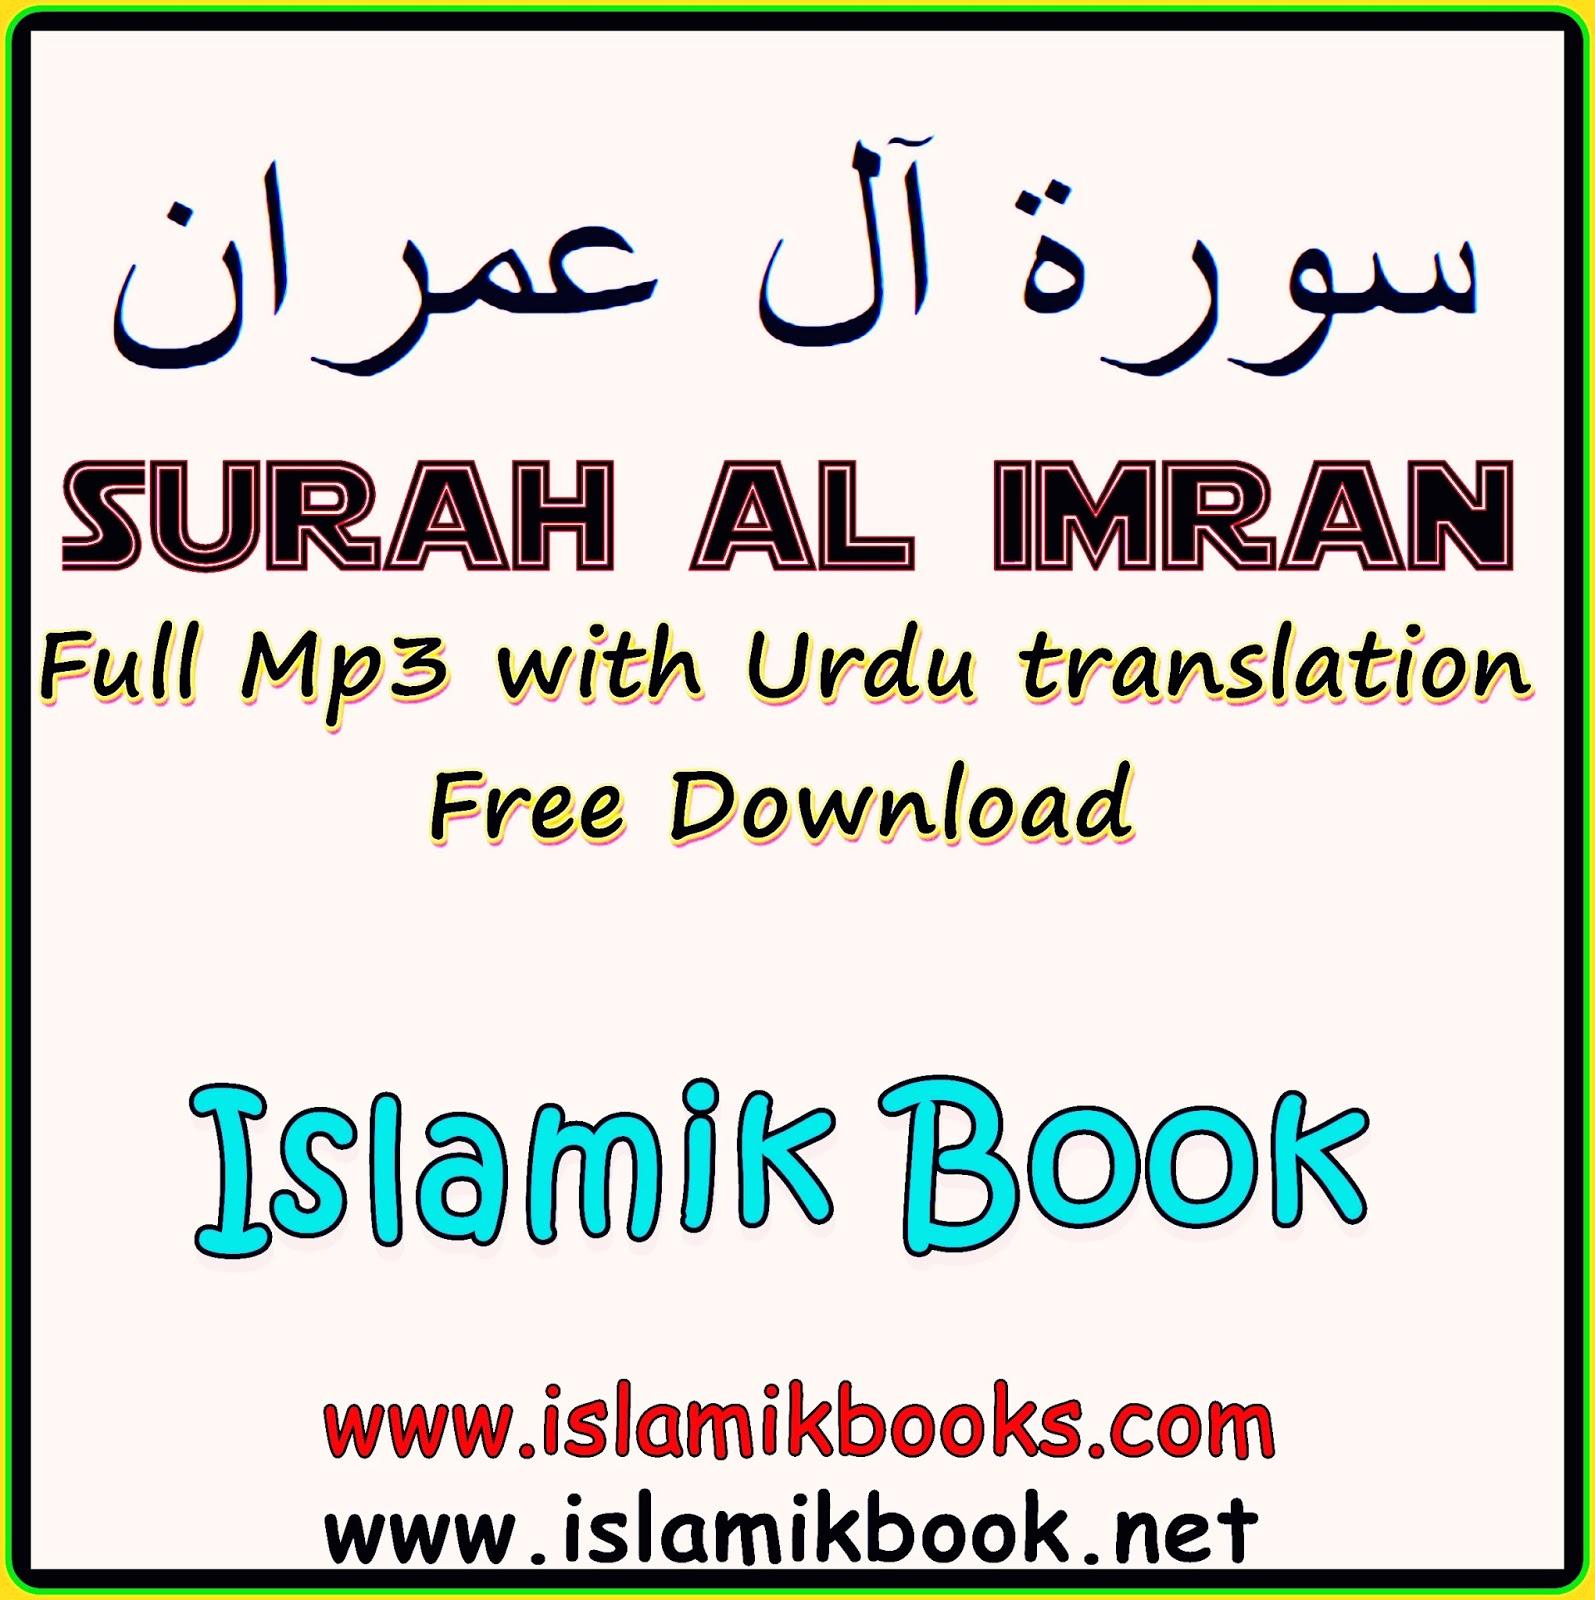 Surah Al Imran Mp3 Download Free with Urdu Translation